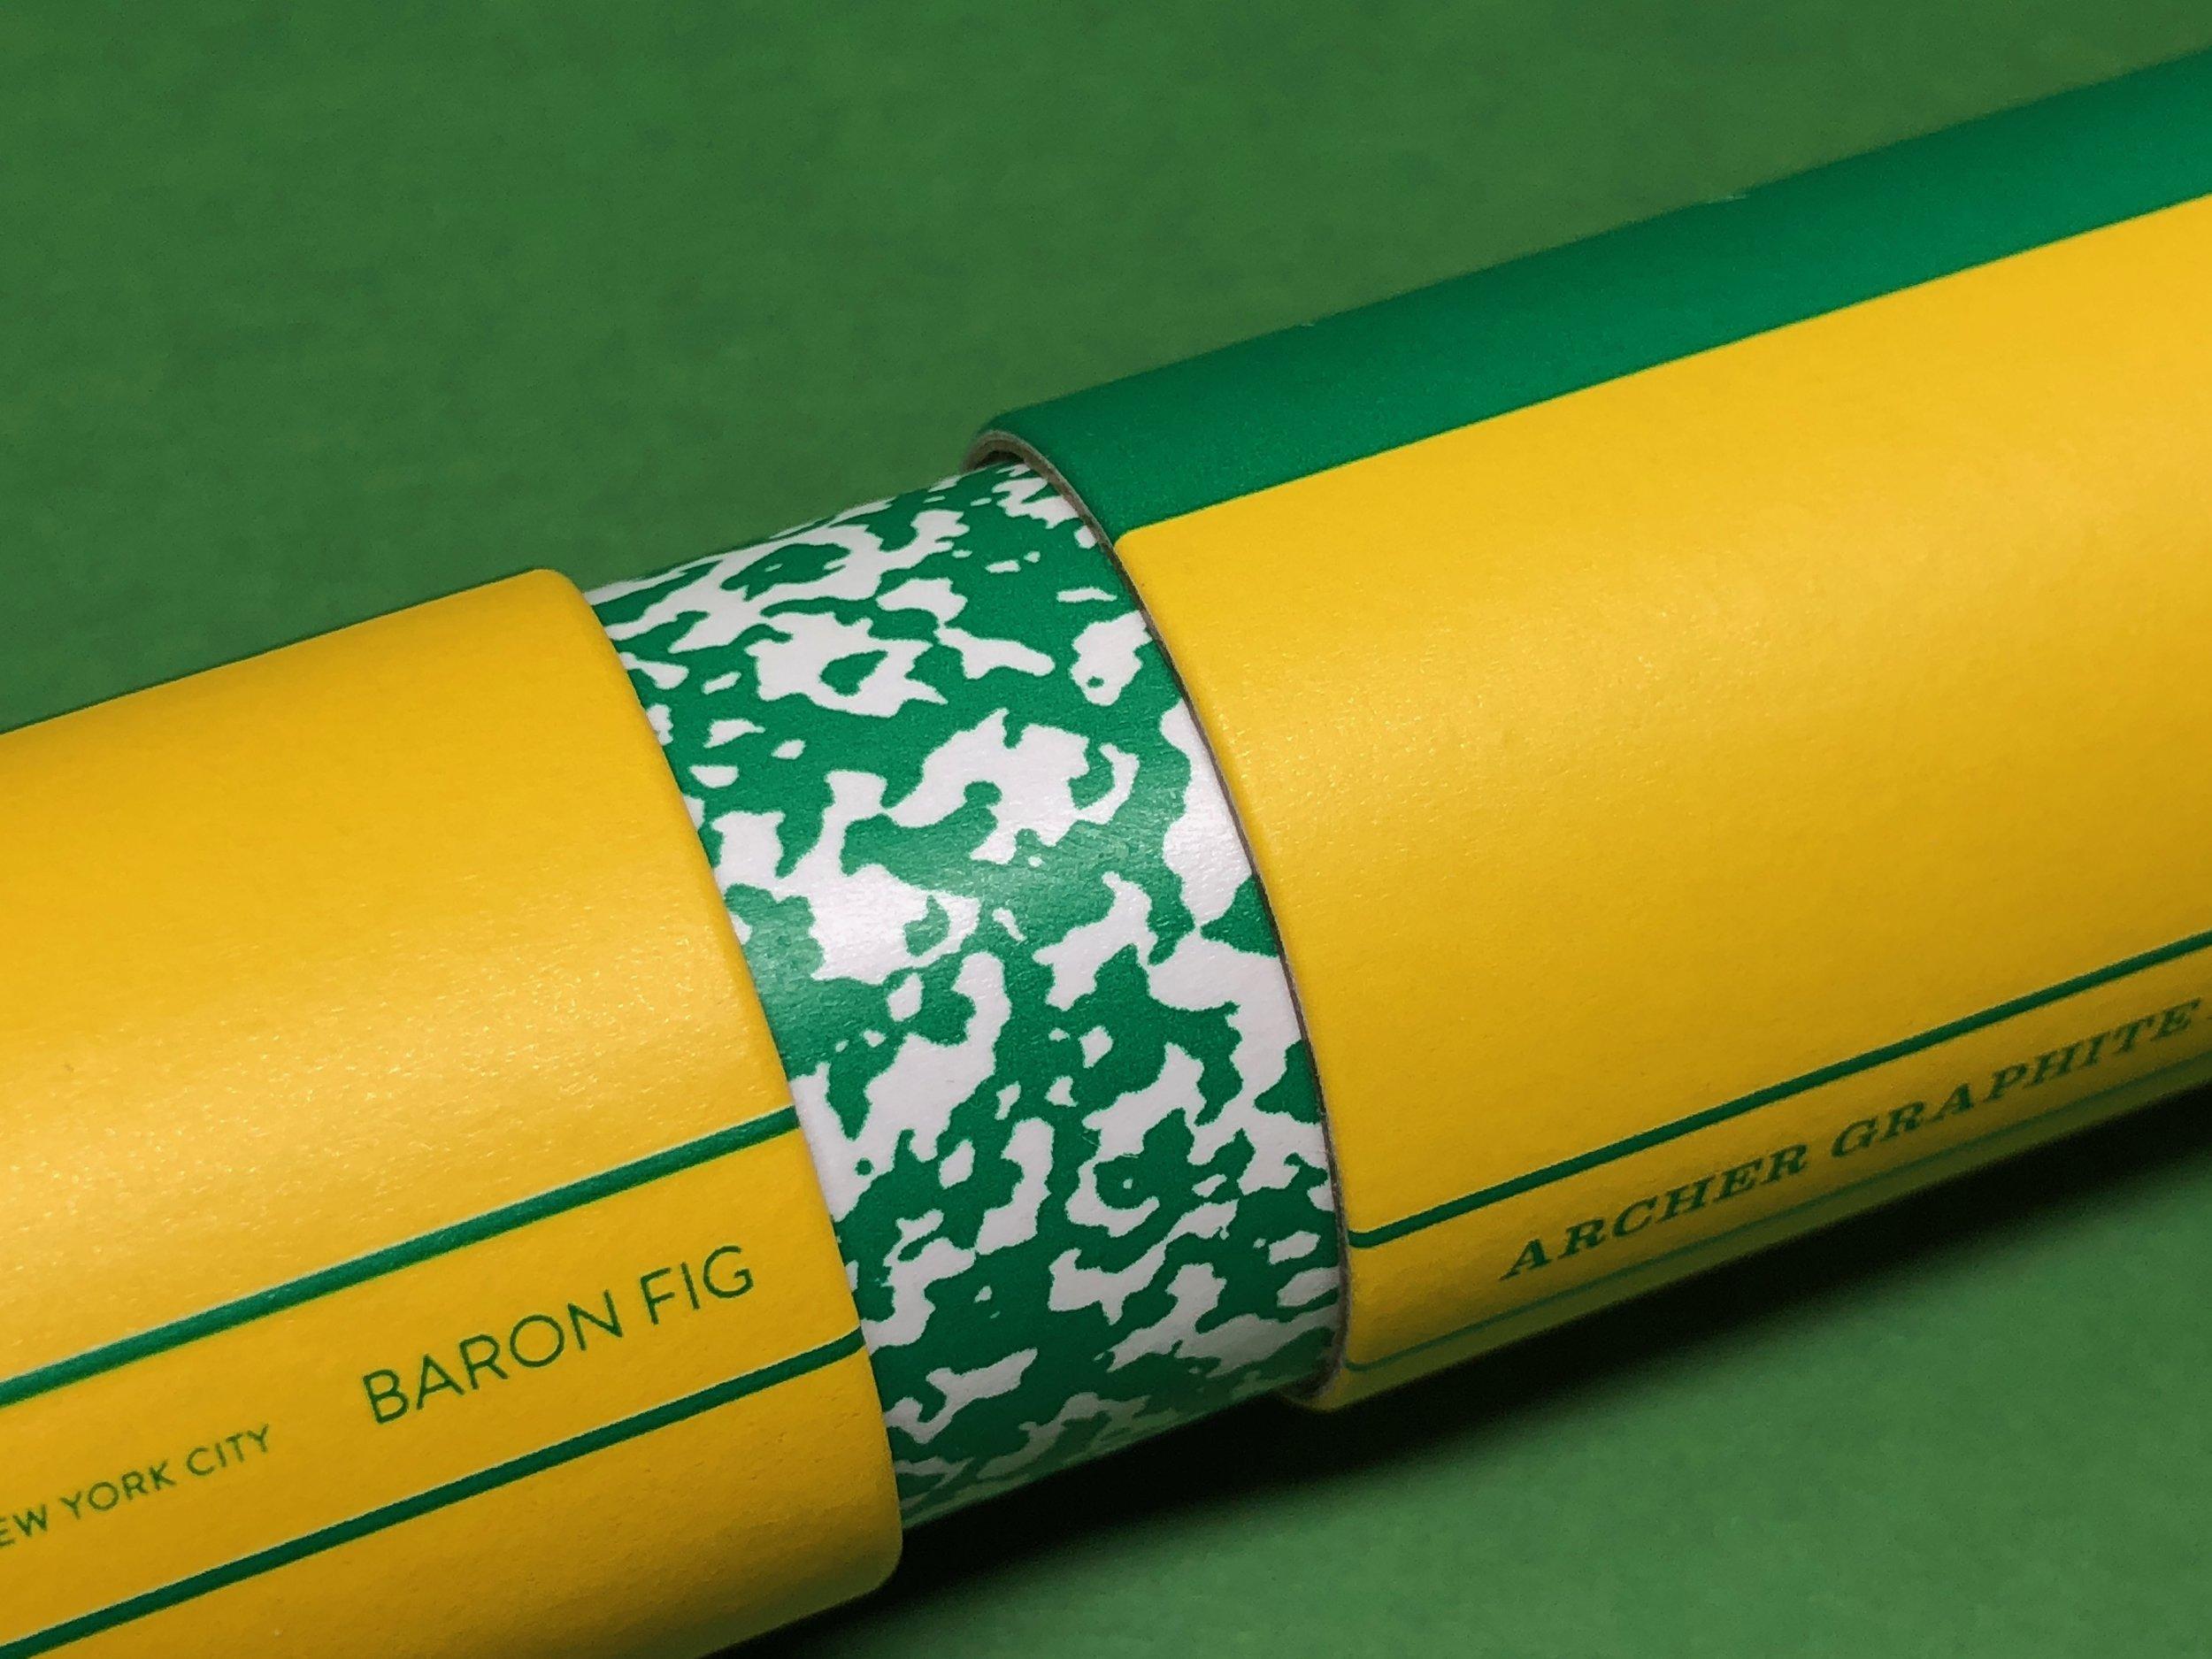 baron-fig-archer-school-pencil-4.jpg